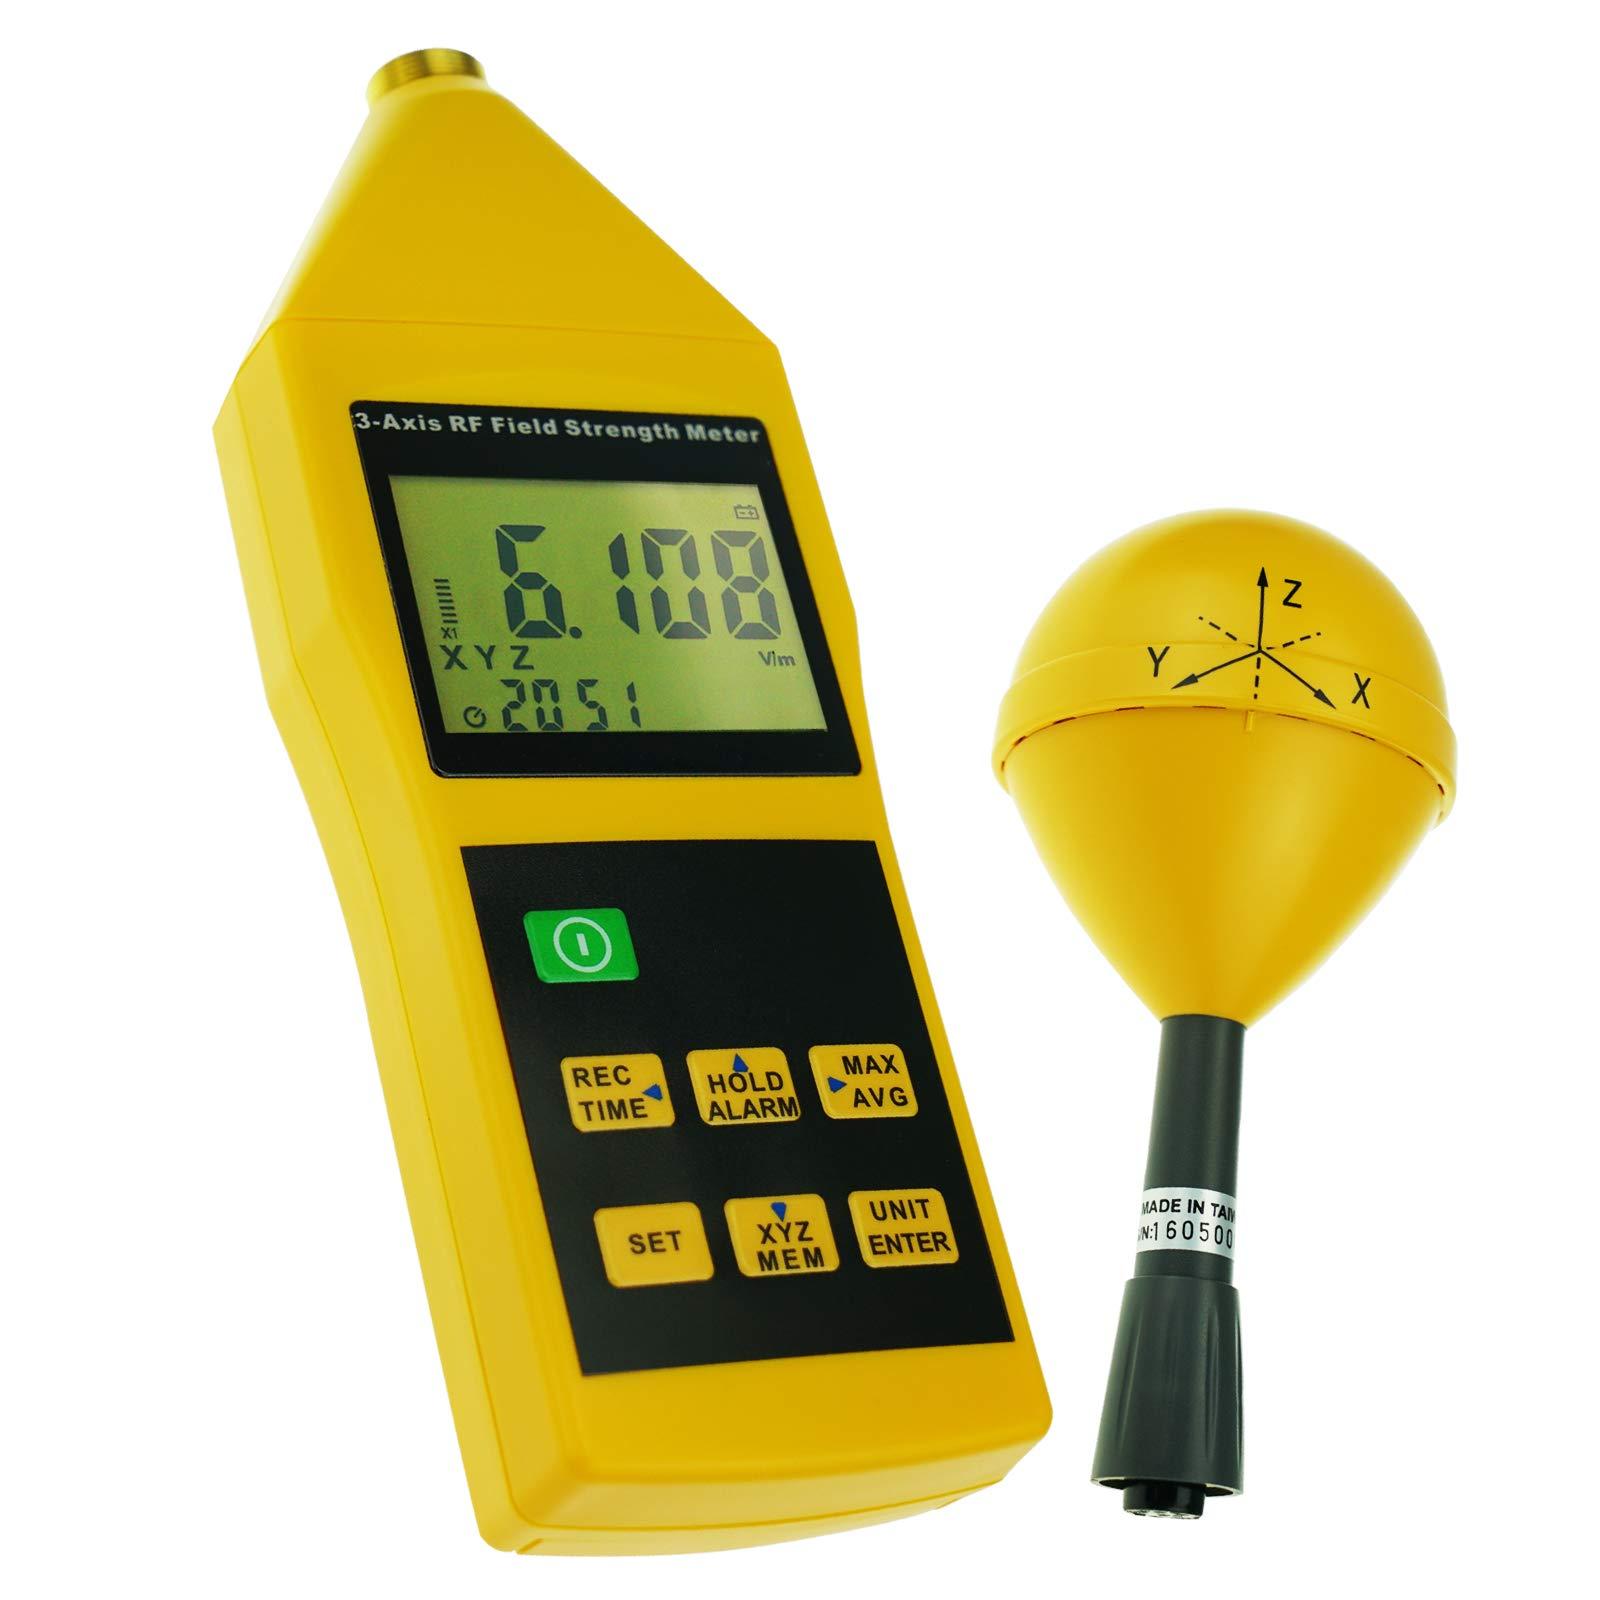 EMF/RF Triple Axis Sensor (X, Y, Z) Electrosmog Meter Tester Radio Frequency Electromagnetic Power Detector Tester 38mv ~ 11v/m Range 10MHz ~ 8GHz Frequency